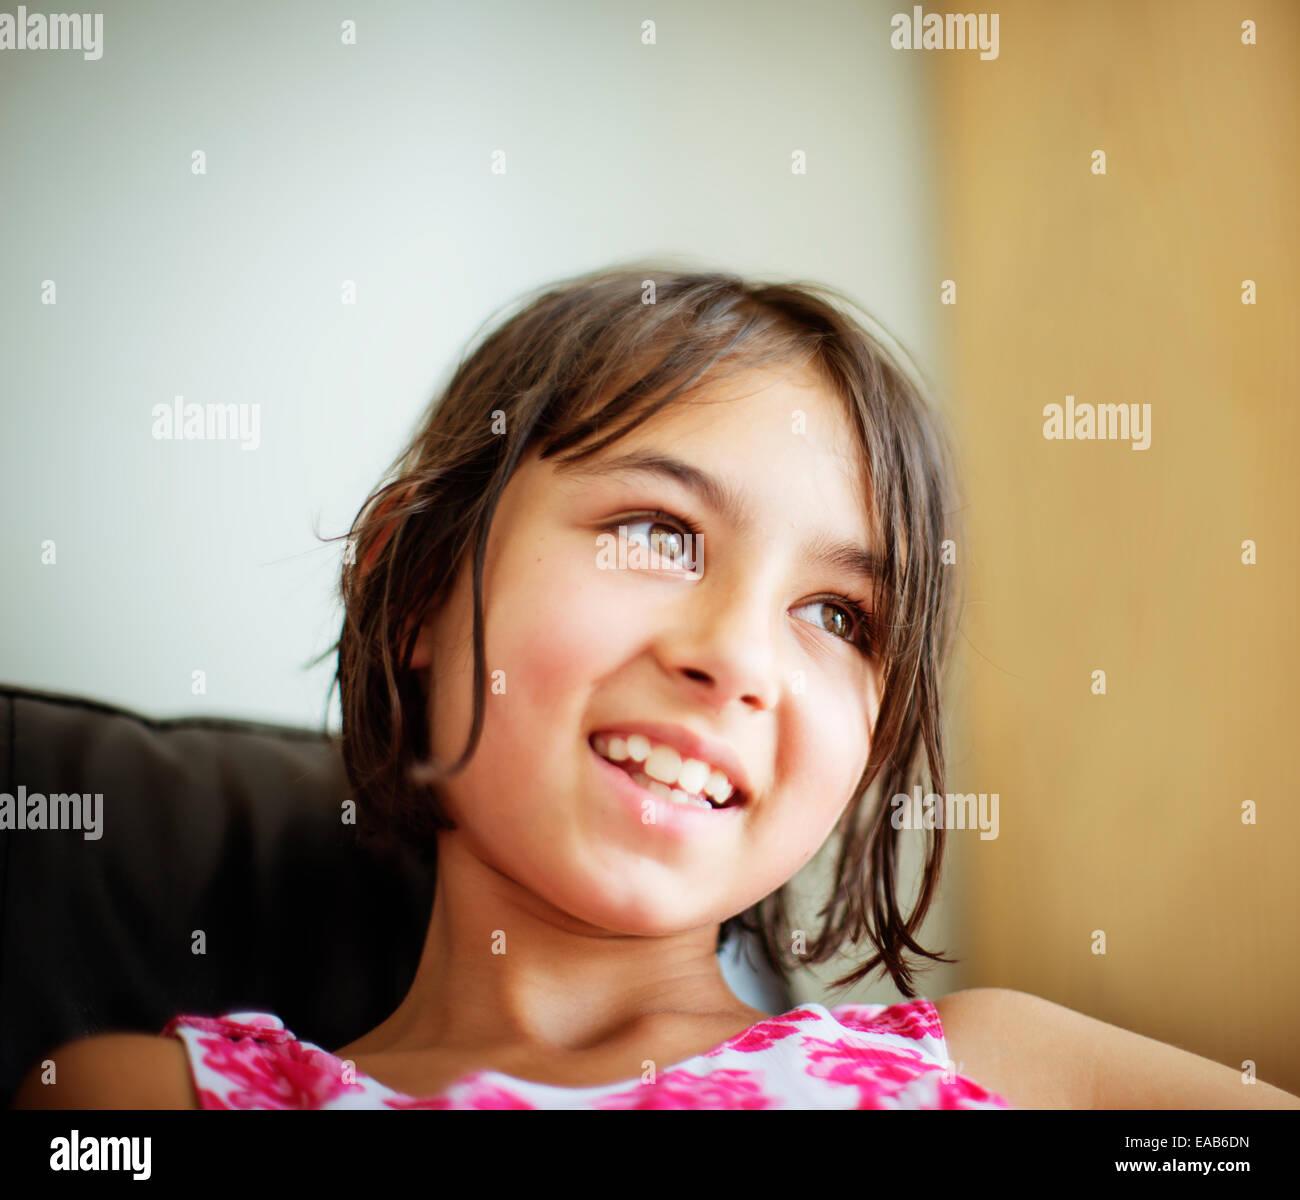 Smiling girl portrait Banque D'Images